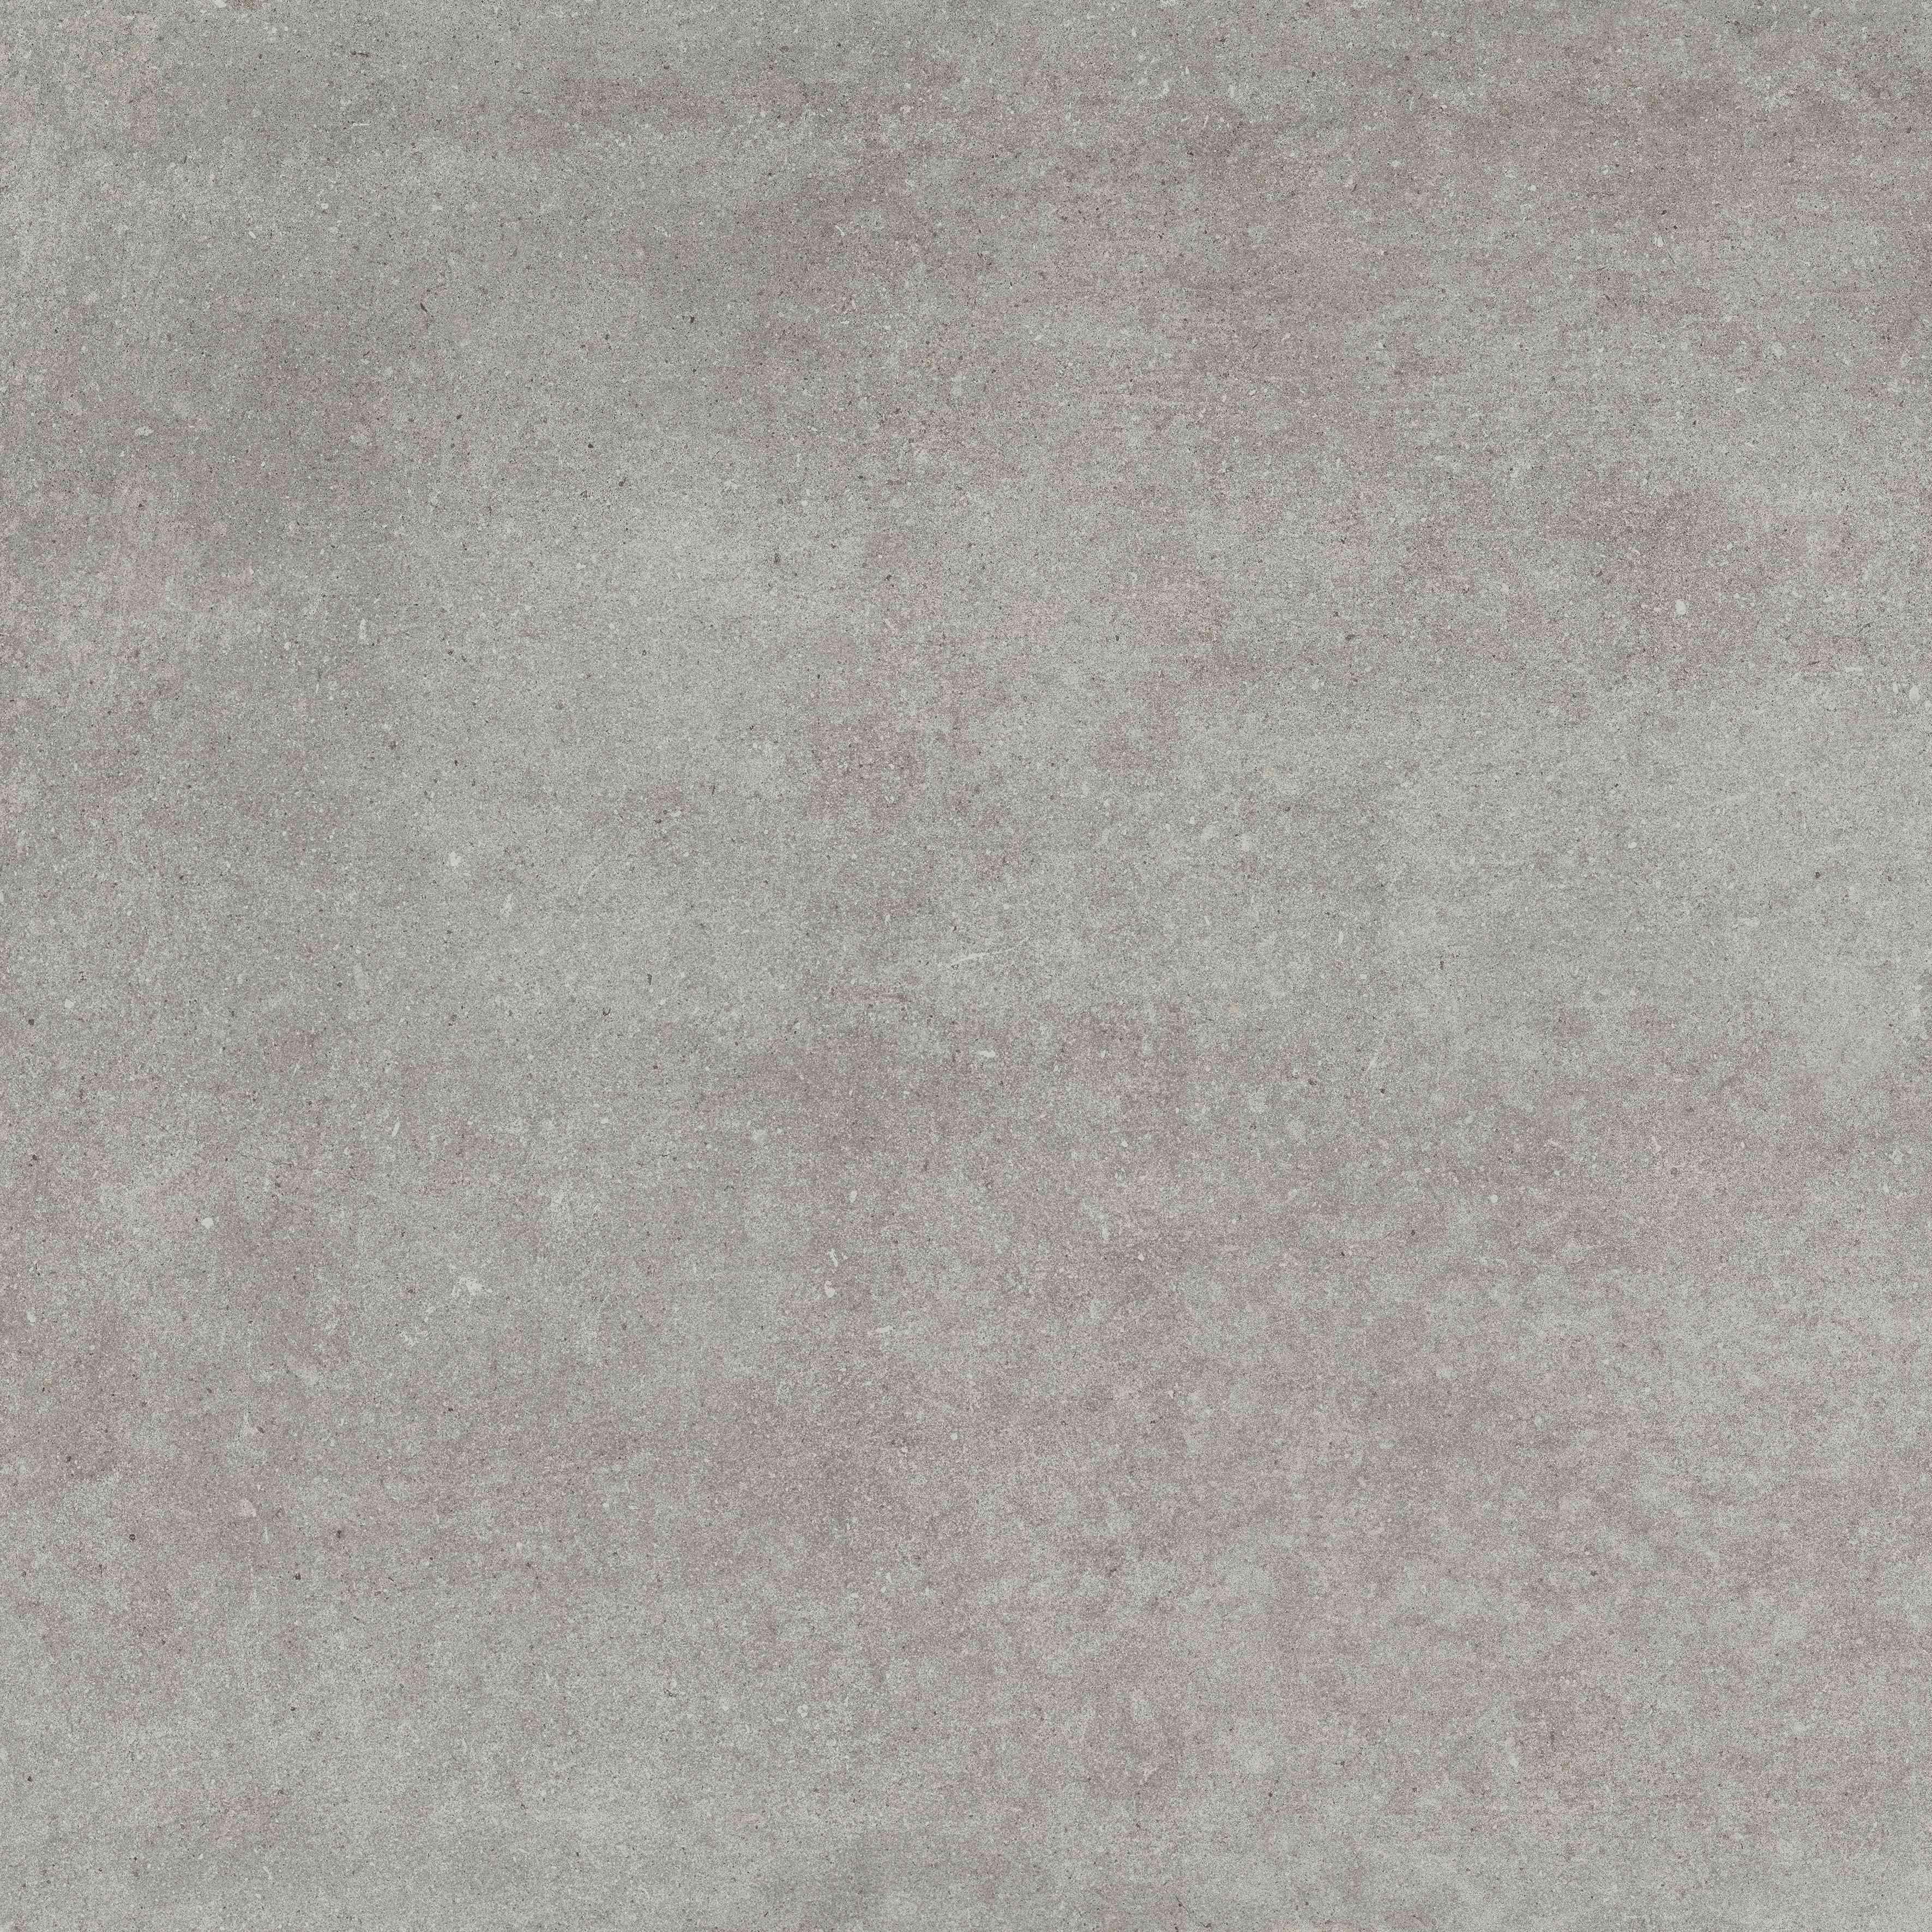 Плитка GRIGIO (ZRXRM8R) изображение 4